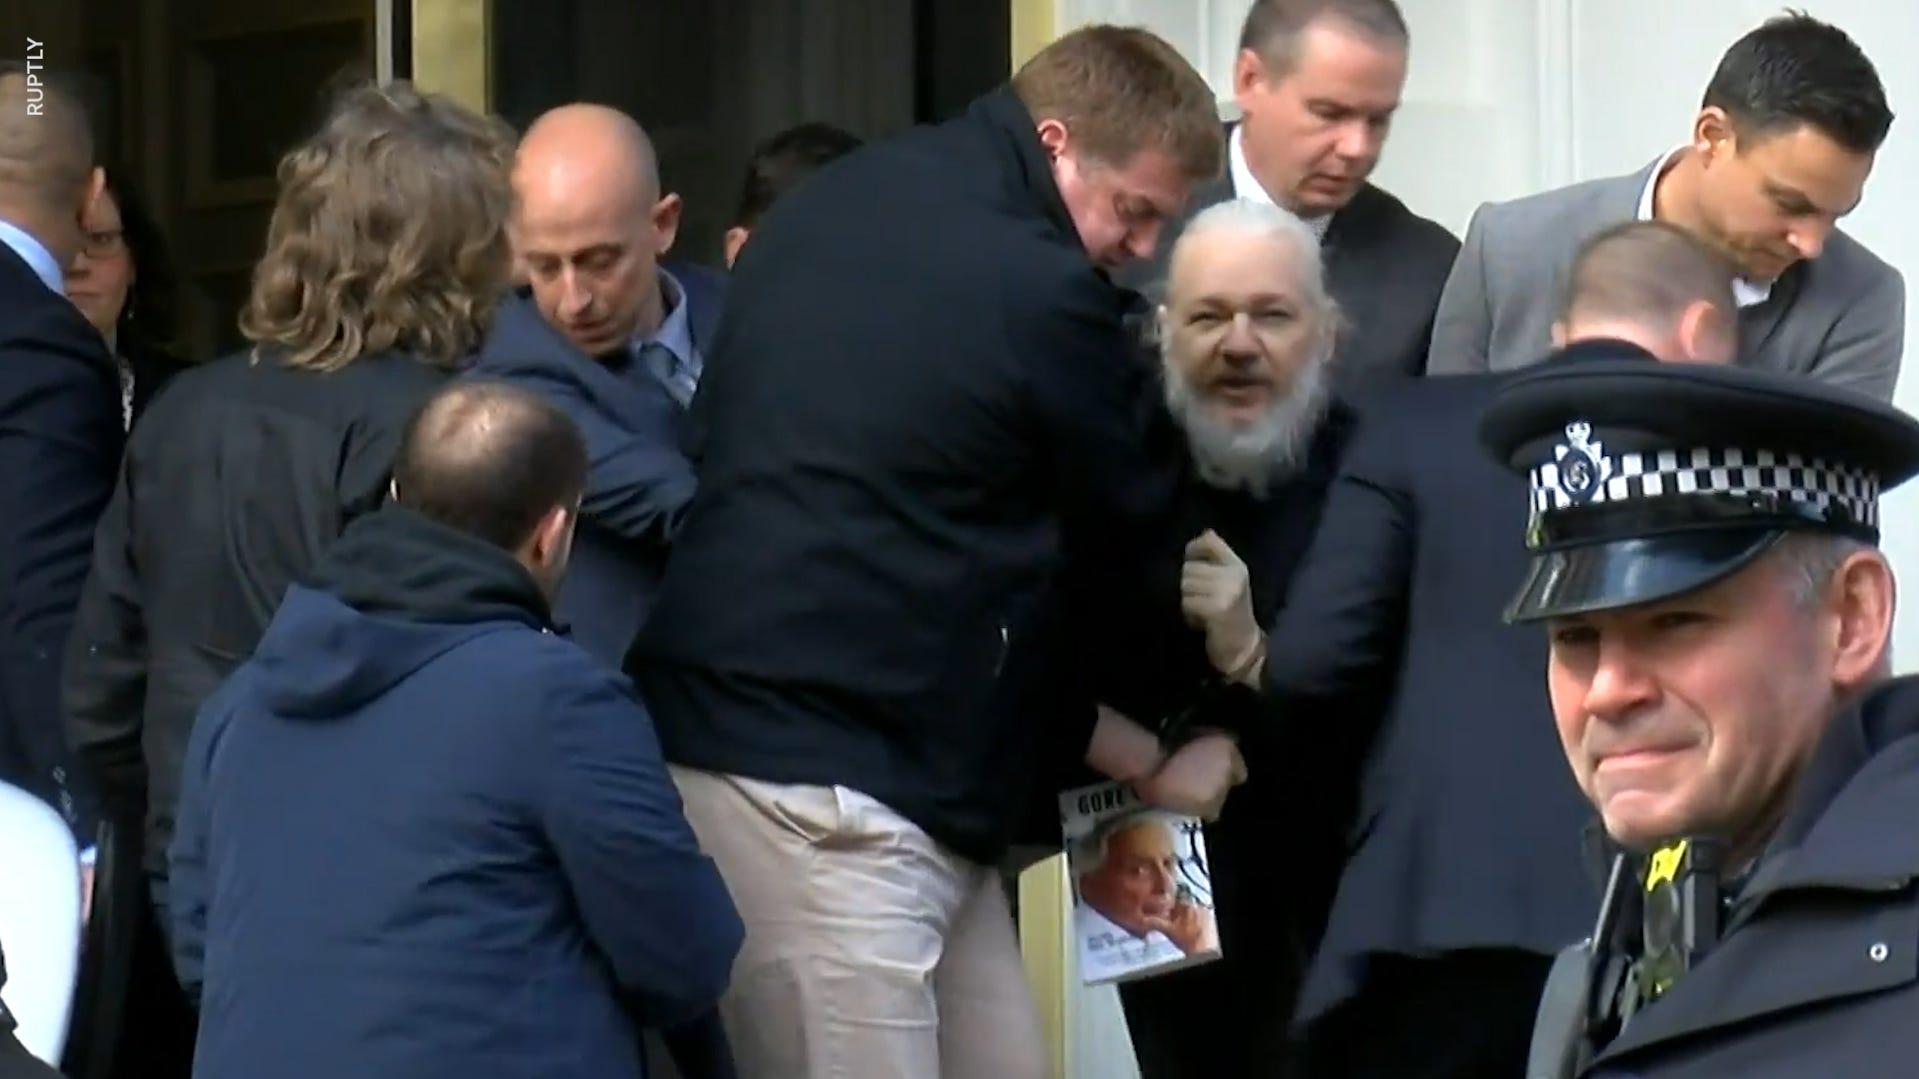 Julian Assange, WikiLeaks founder, was holding Gore Vidal book during arrest